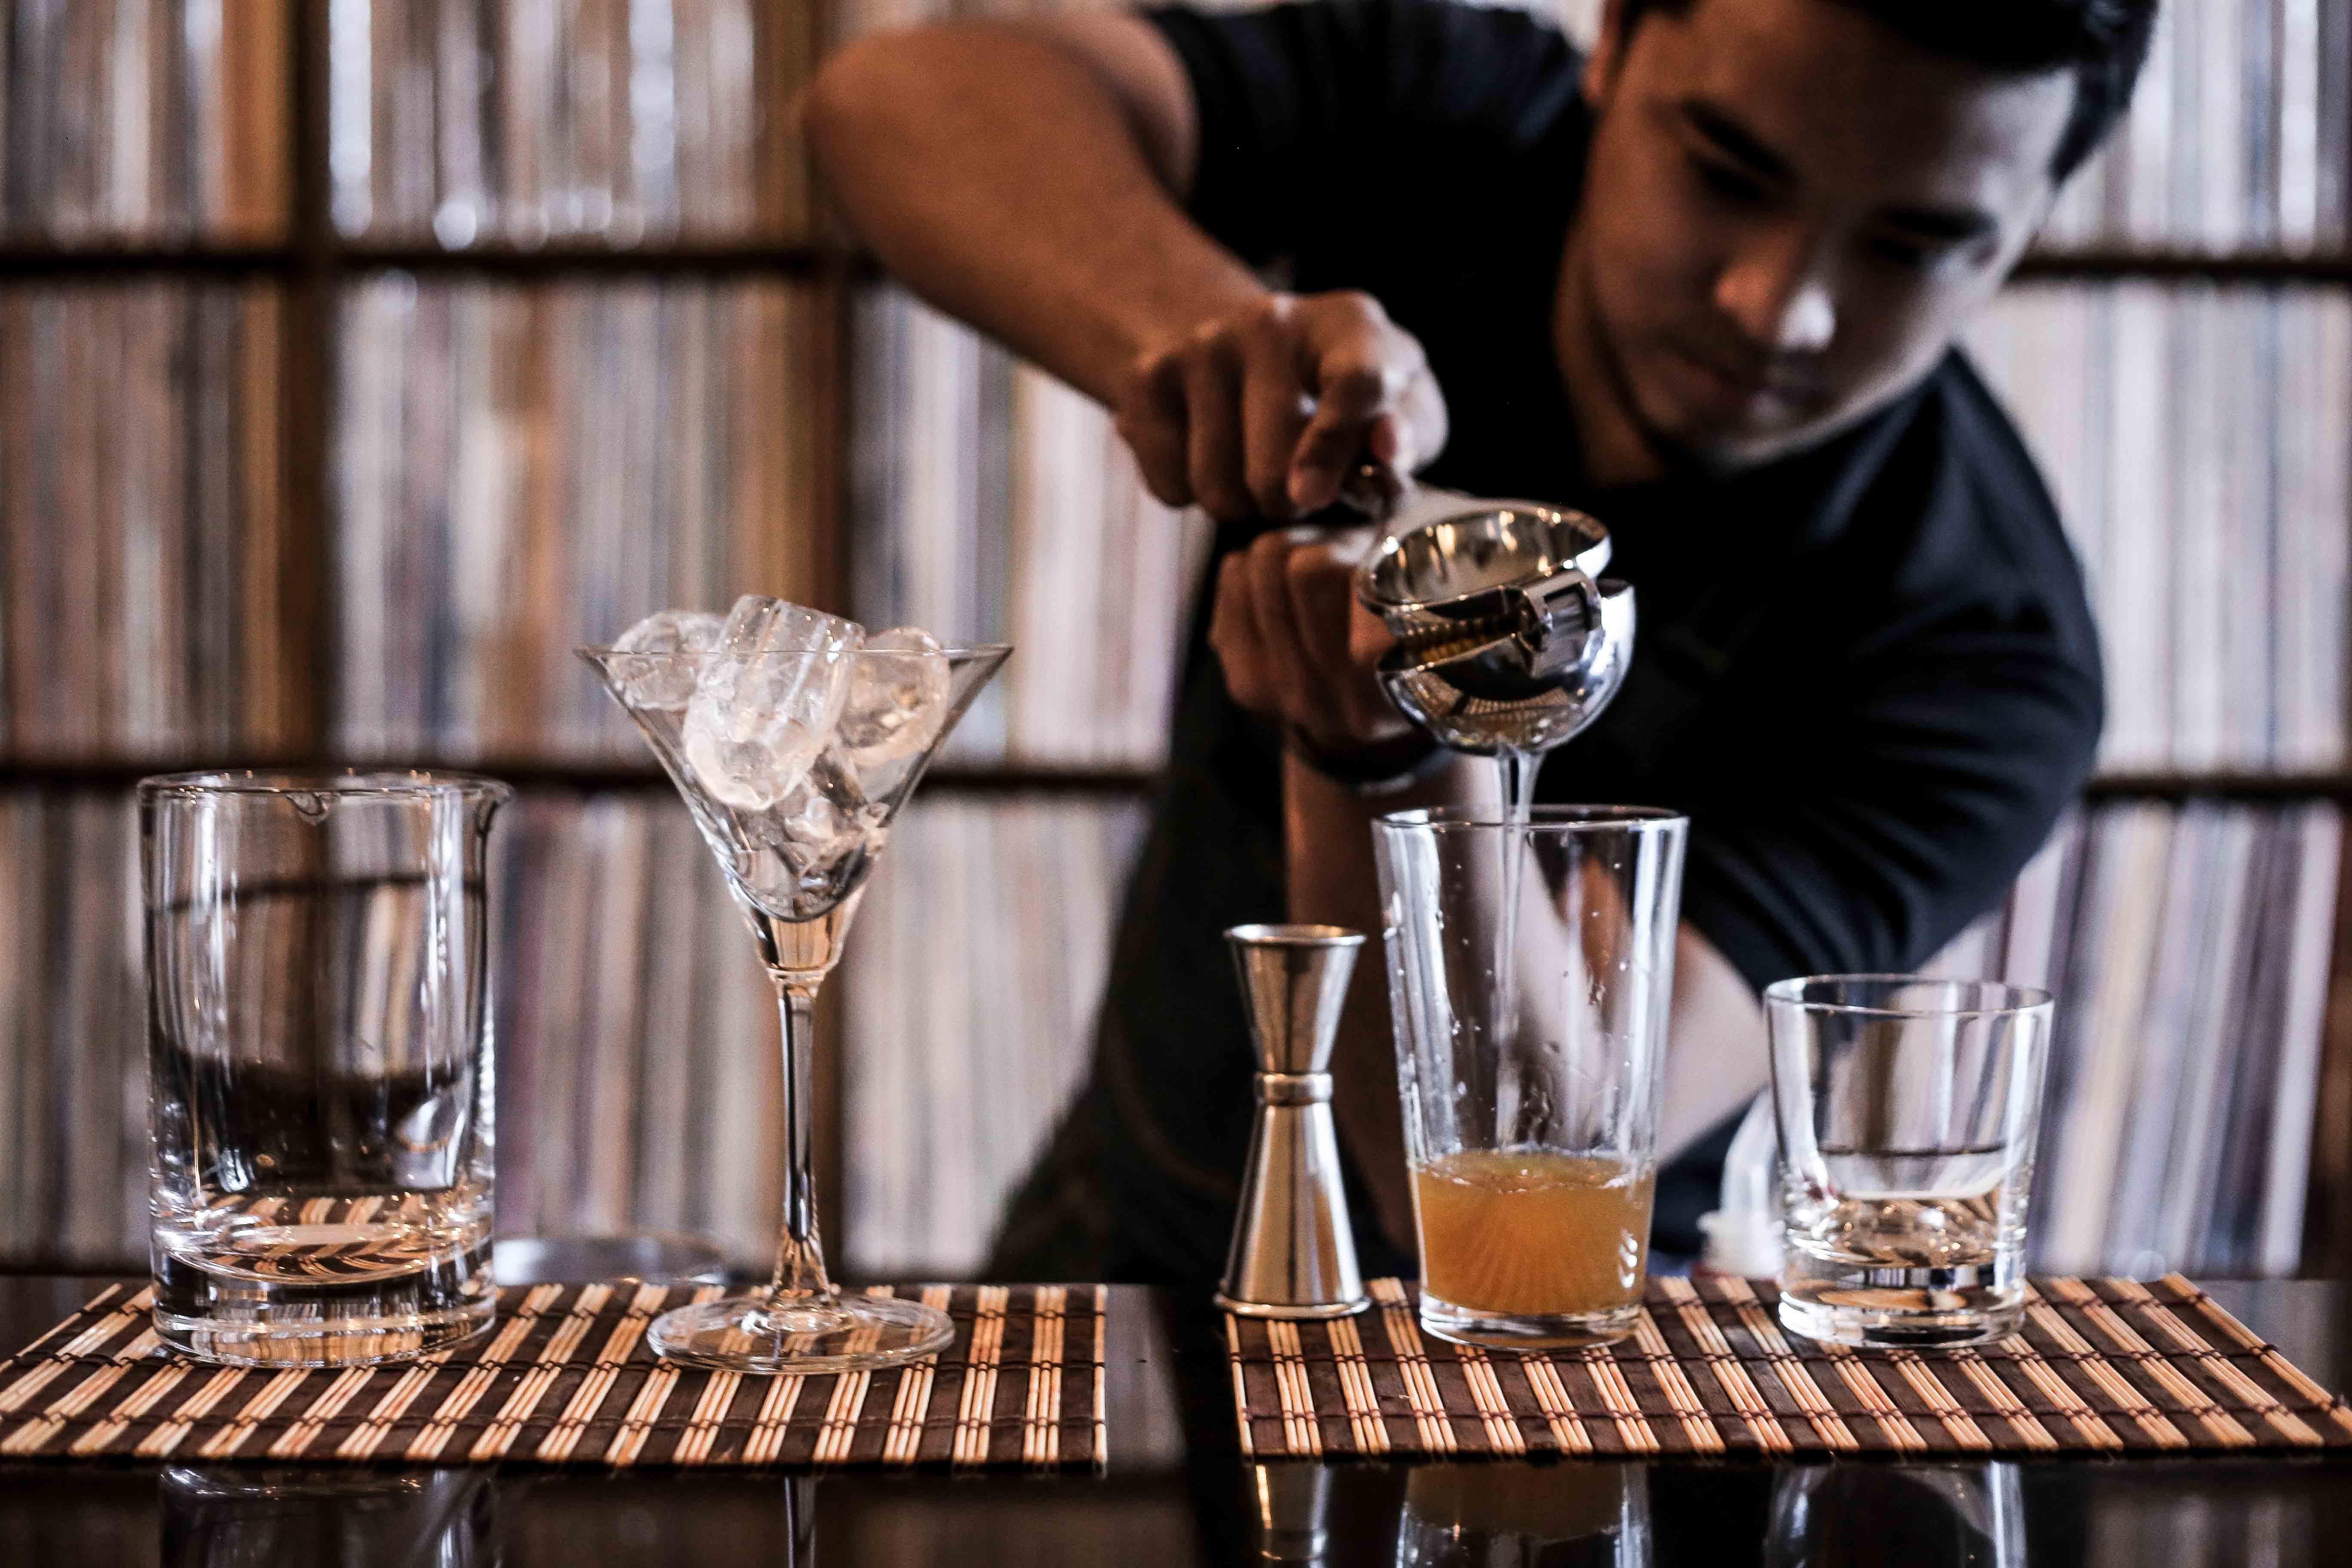 This 15 Seater Bar Has Over 9 000 Vinyl Records Nolisoli